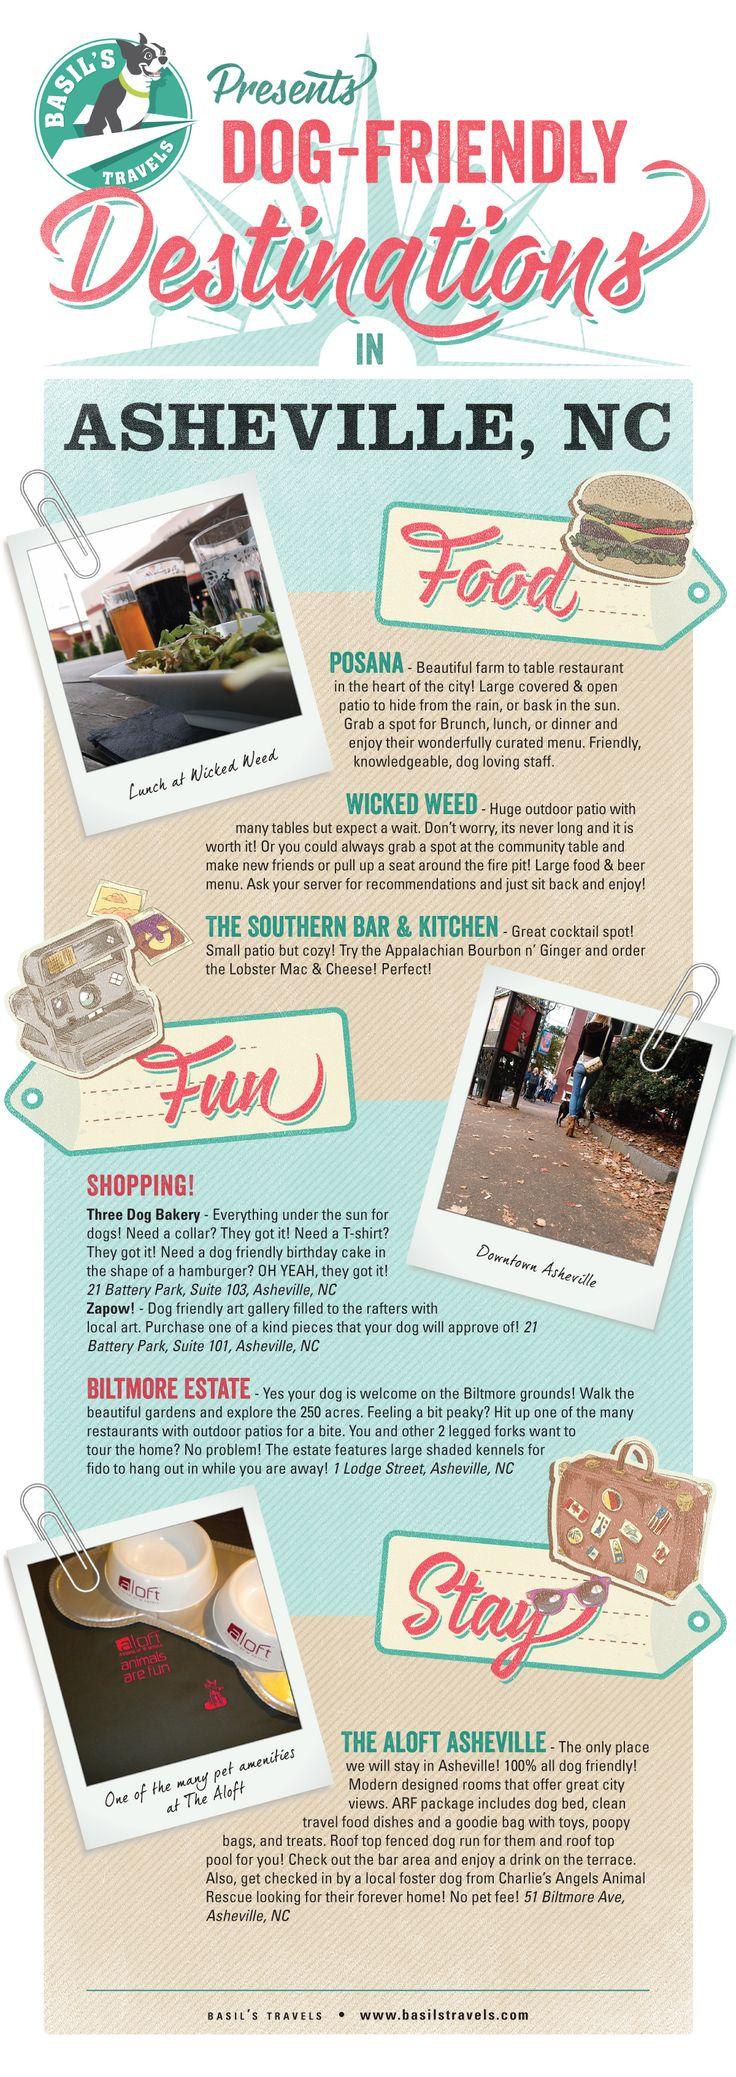 Travel Poster | Dog Friendly Asheville, NC | Basil's Travels